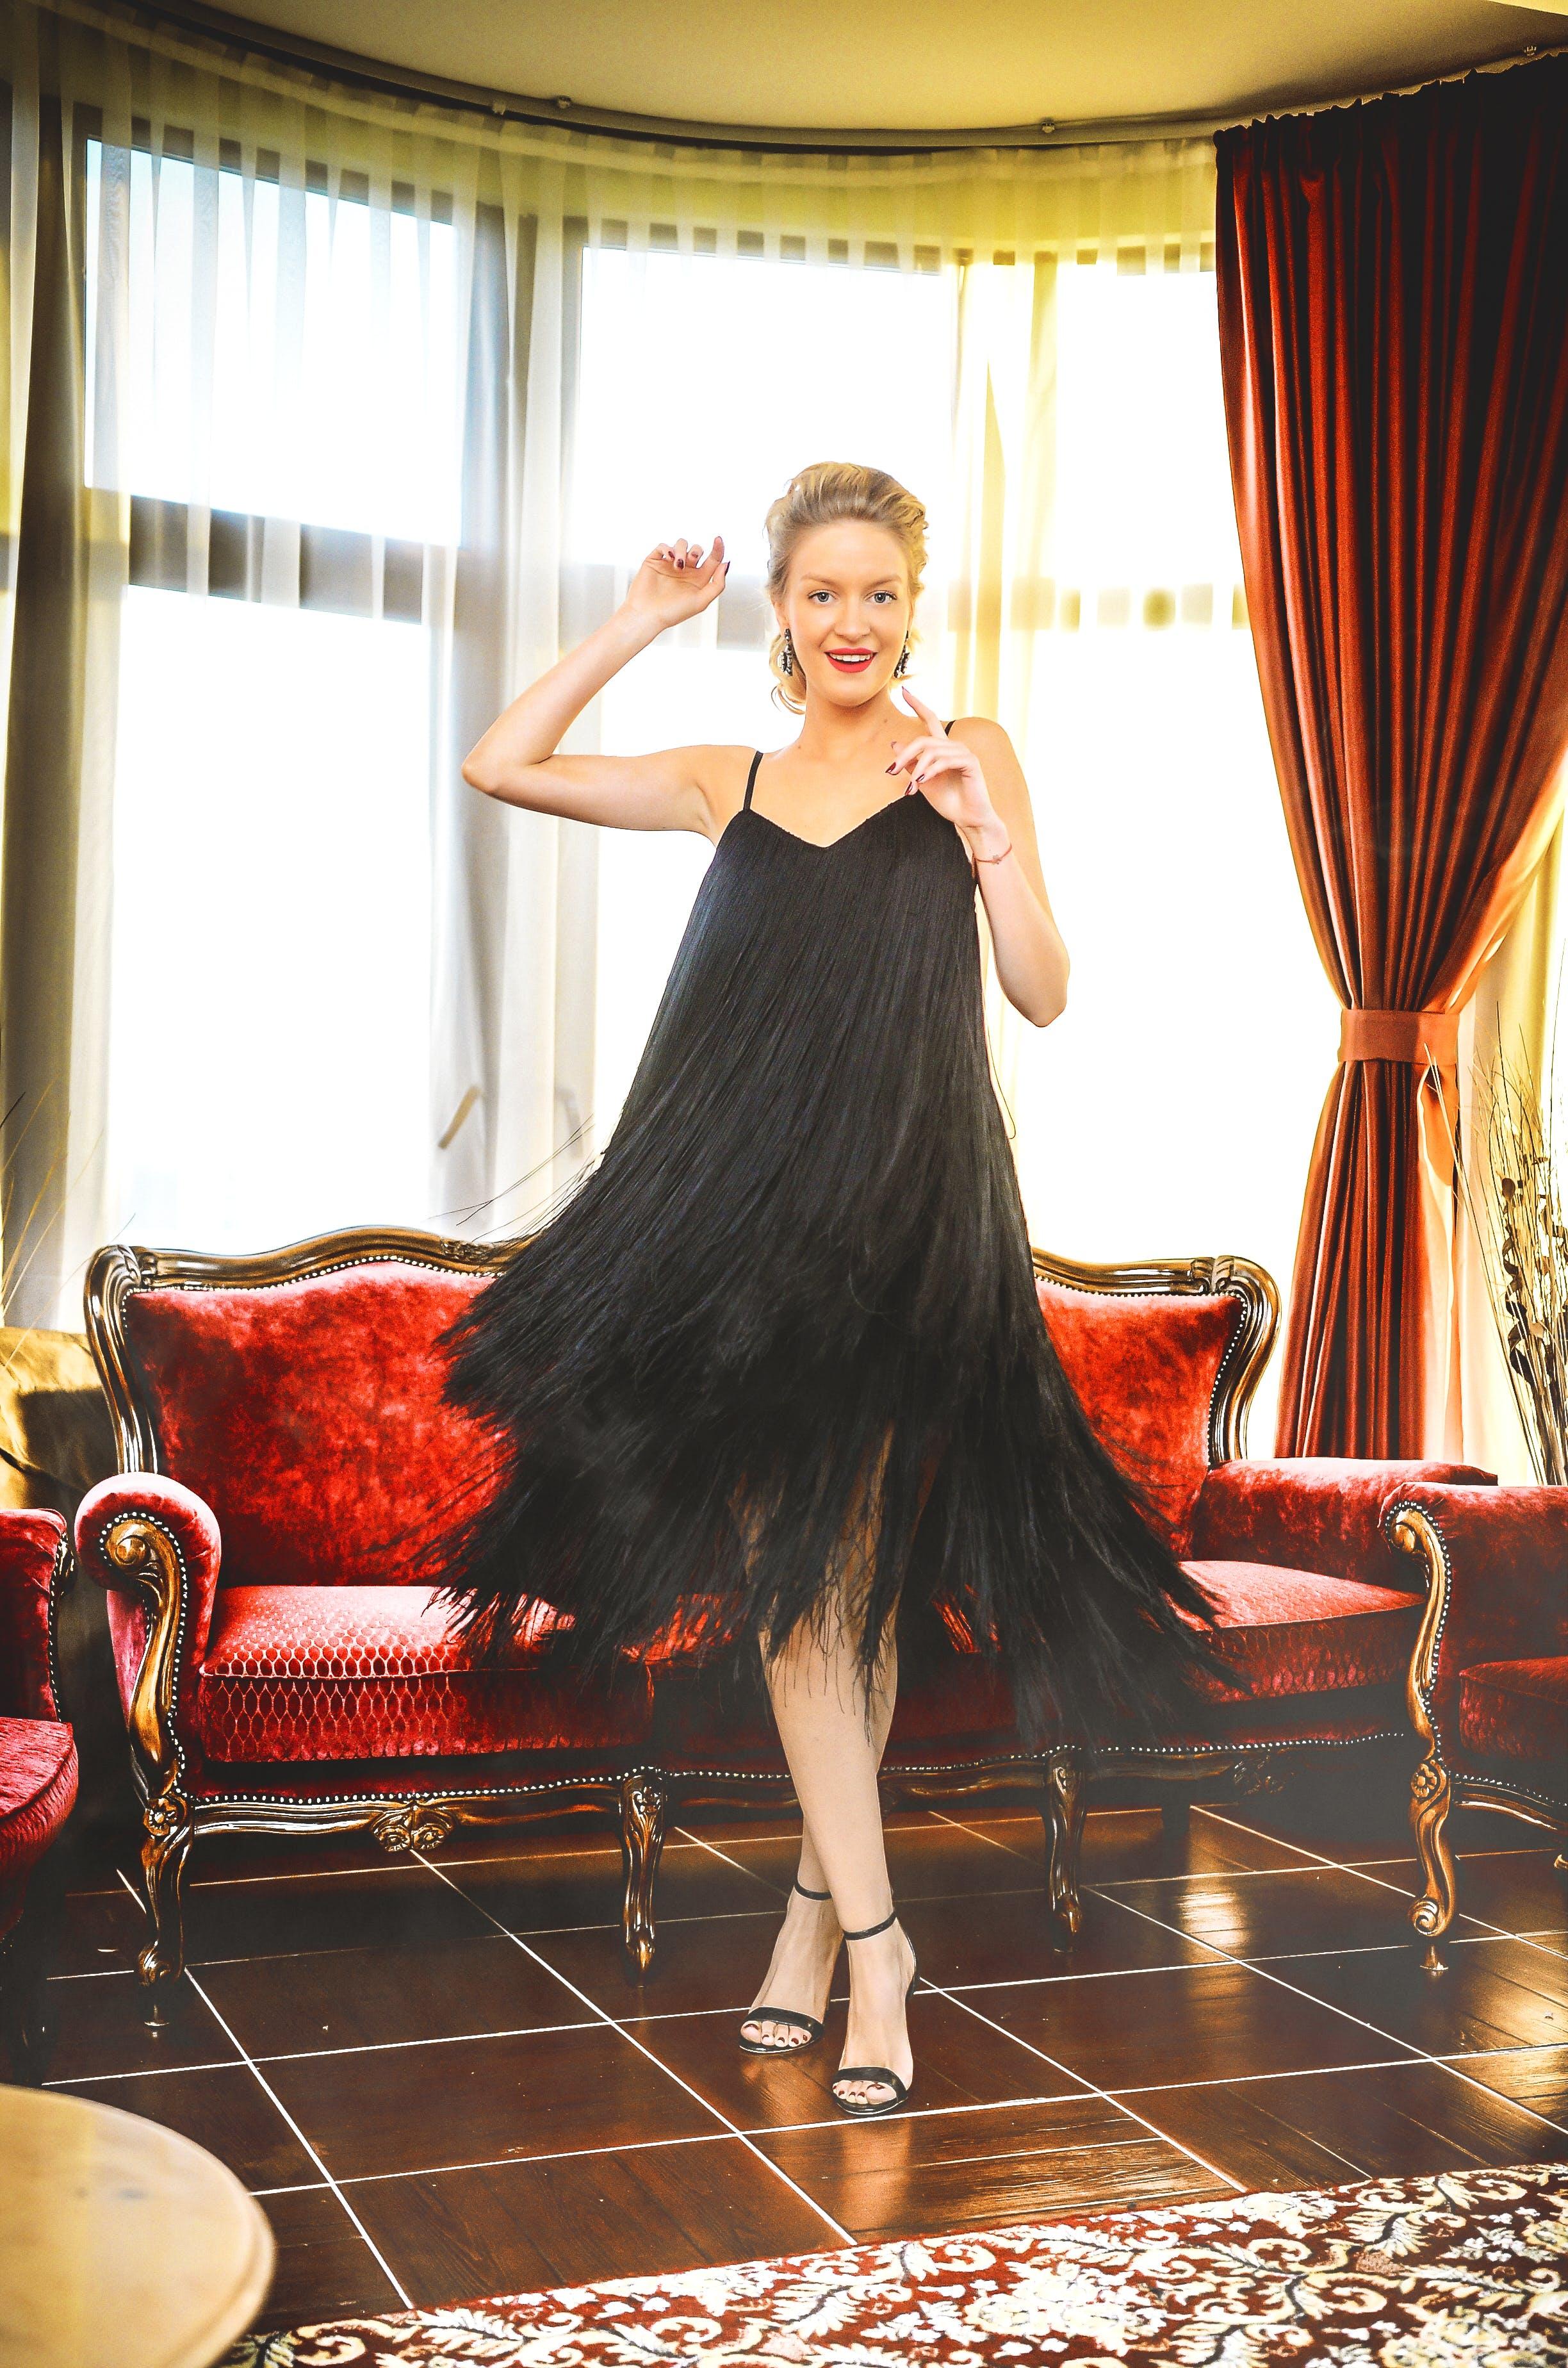 Woman In Black Spaghetti Strap Dress